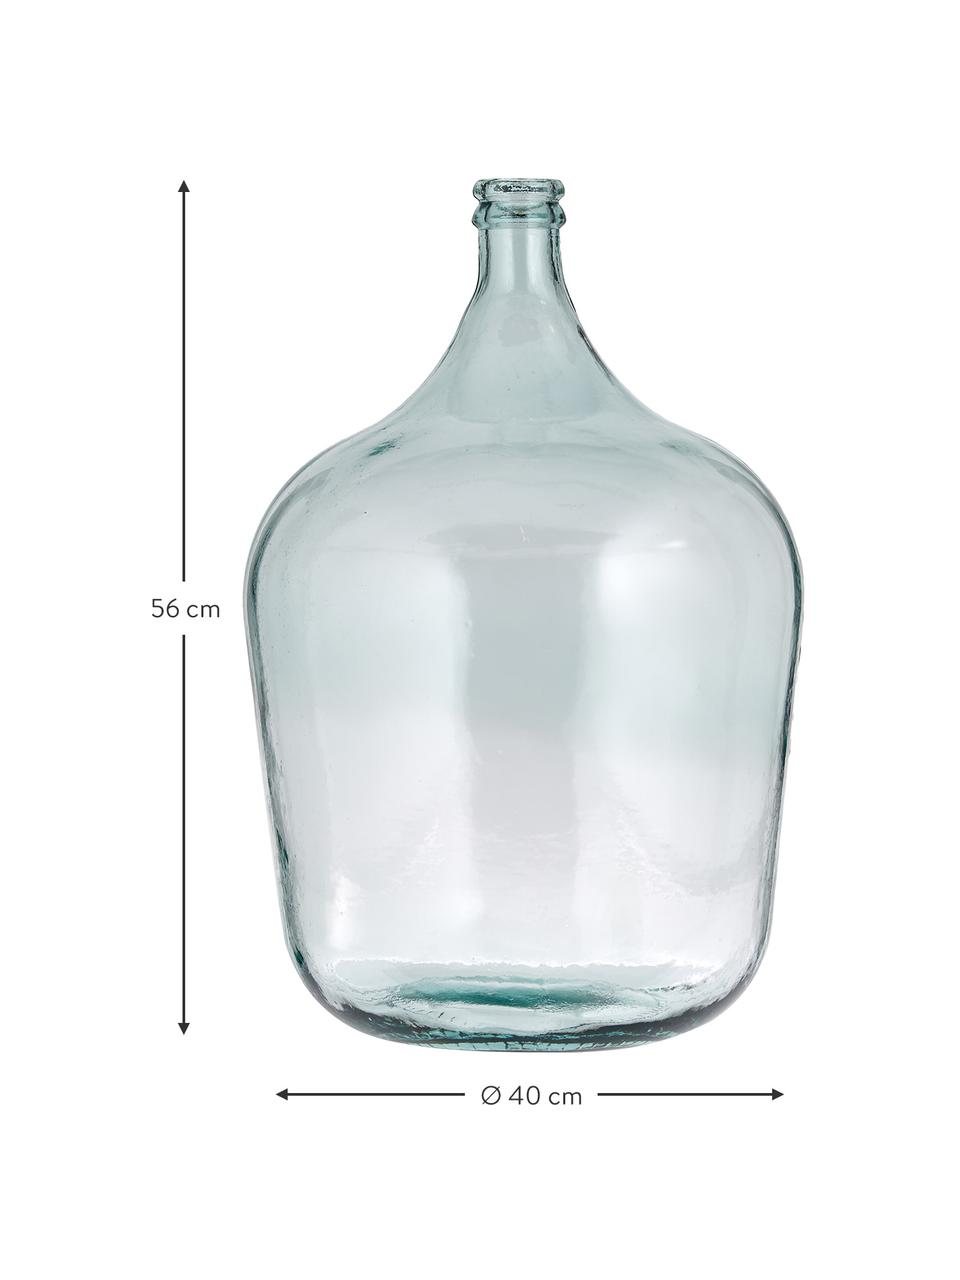 Bodenvase Beluga aus recyceltem Glas, Recyceltes Glas, Hellblau, Ø 40 x H 56 cm